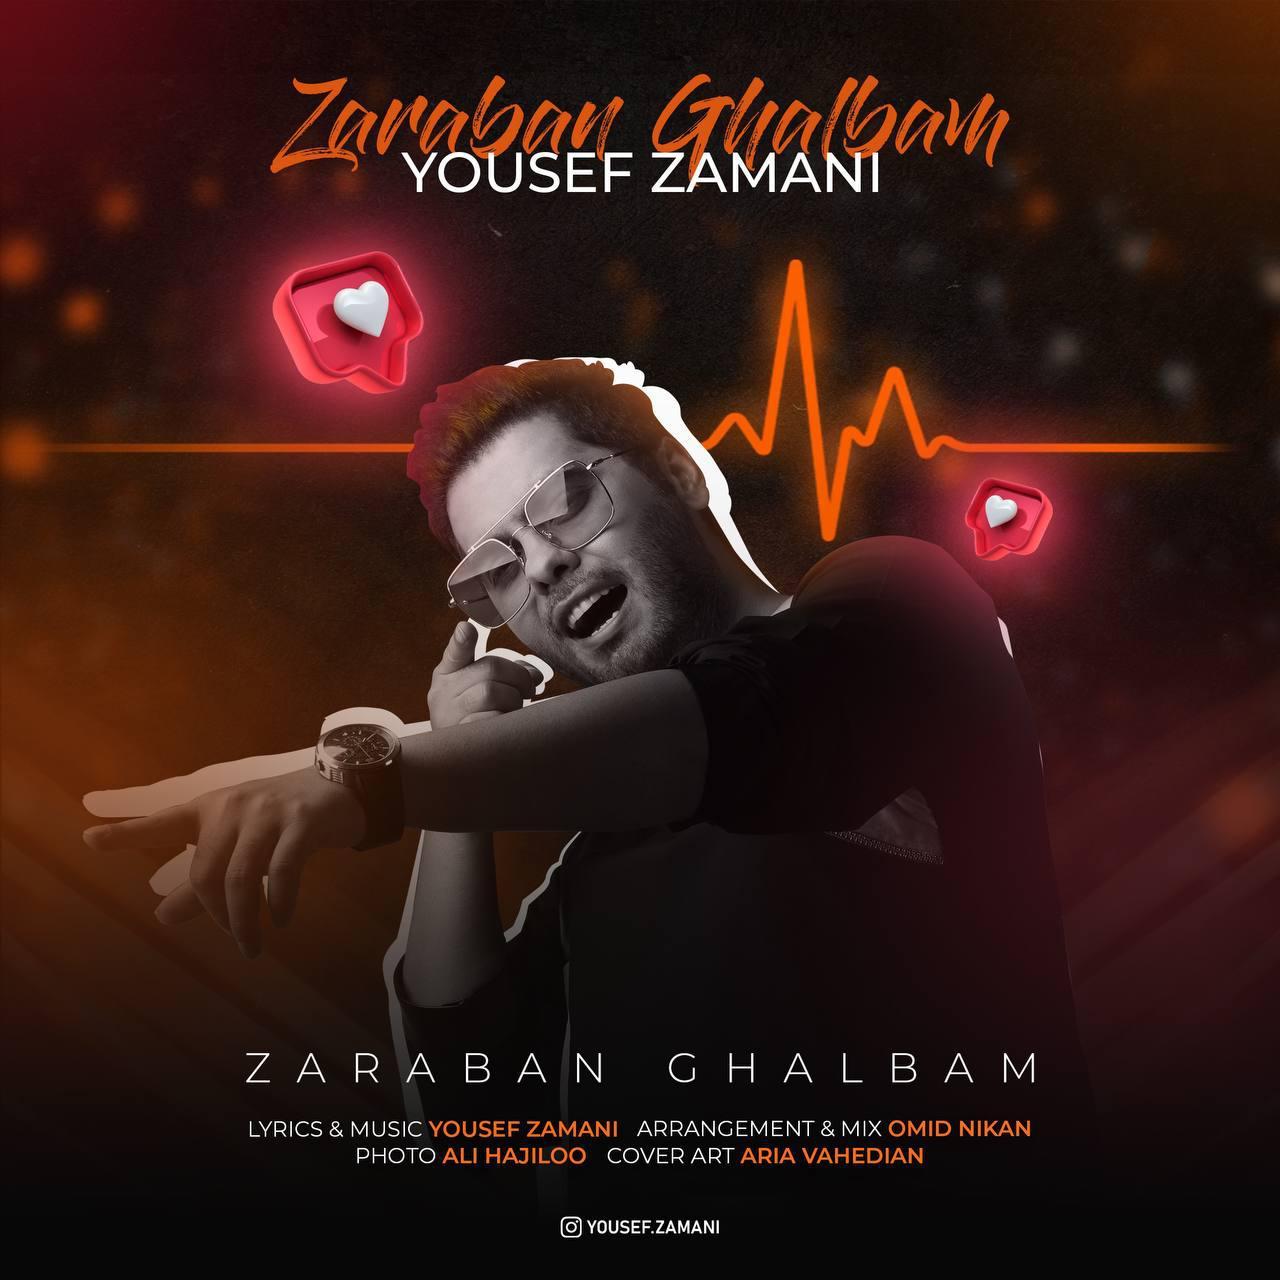 Yousef Zamani - Zaraban Ghalbam